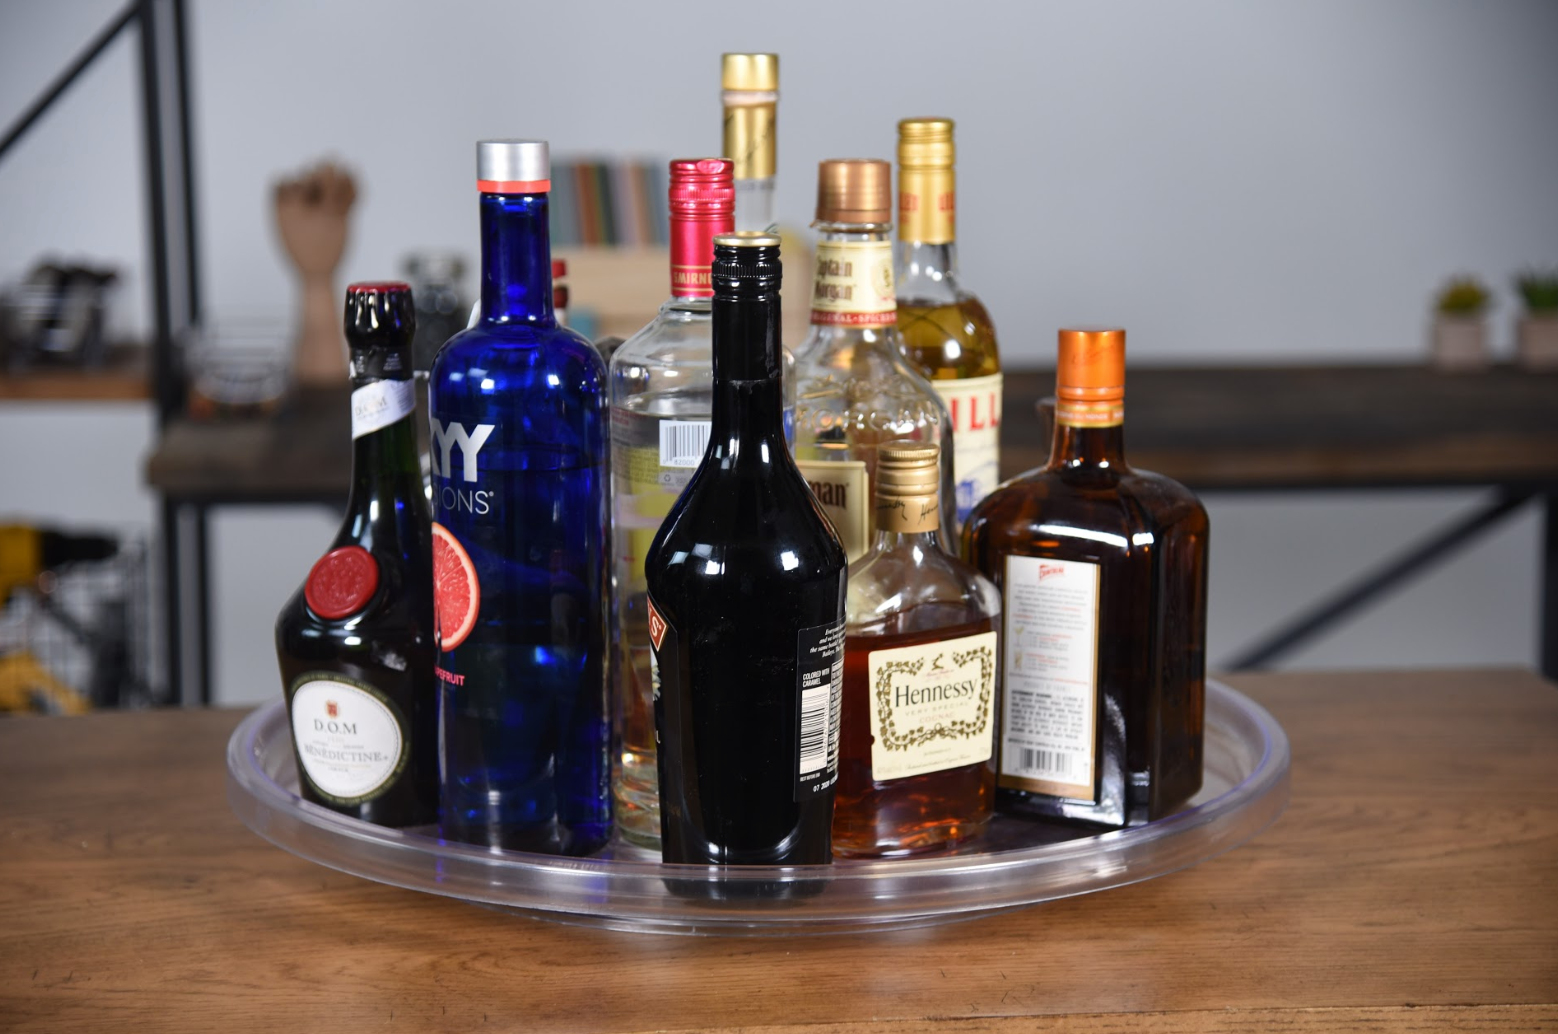 alcohol on a lazy susan